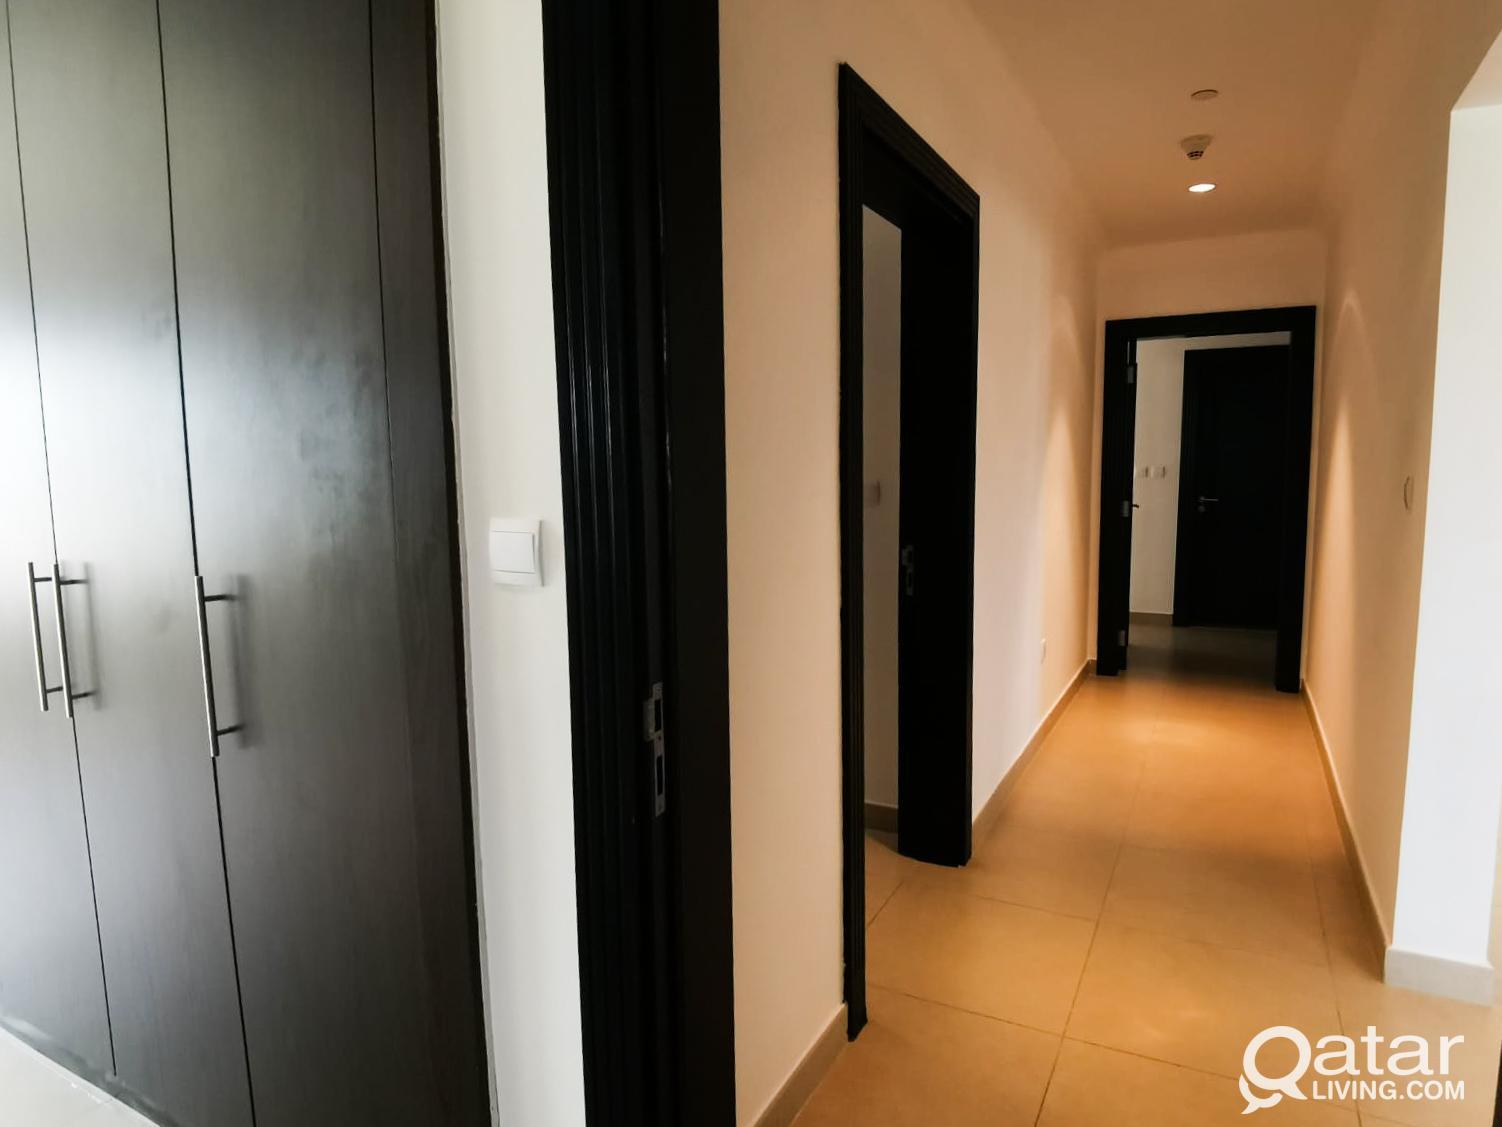 Large 3 Bed Room with Astonishing Direct Marina Vi